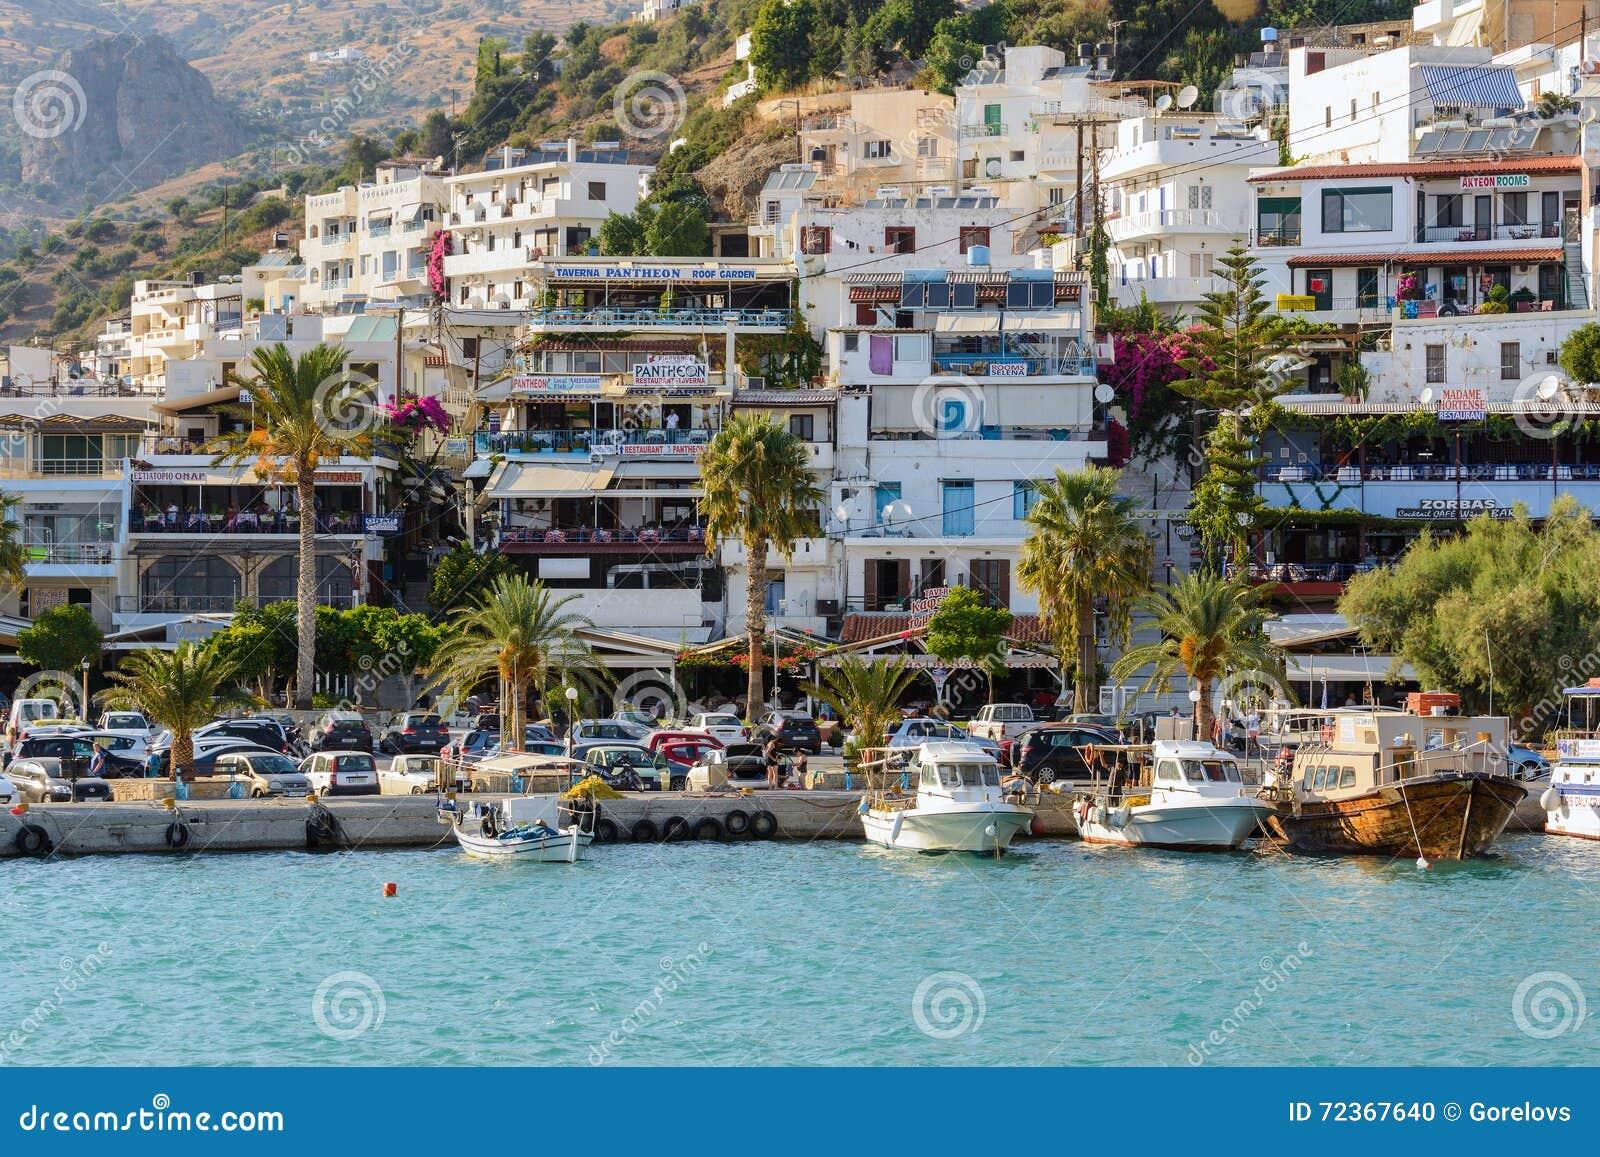 Aghia Galini镇PHarbour有停放的渔船和美丽的房子的在克利特海岛的岩石的